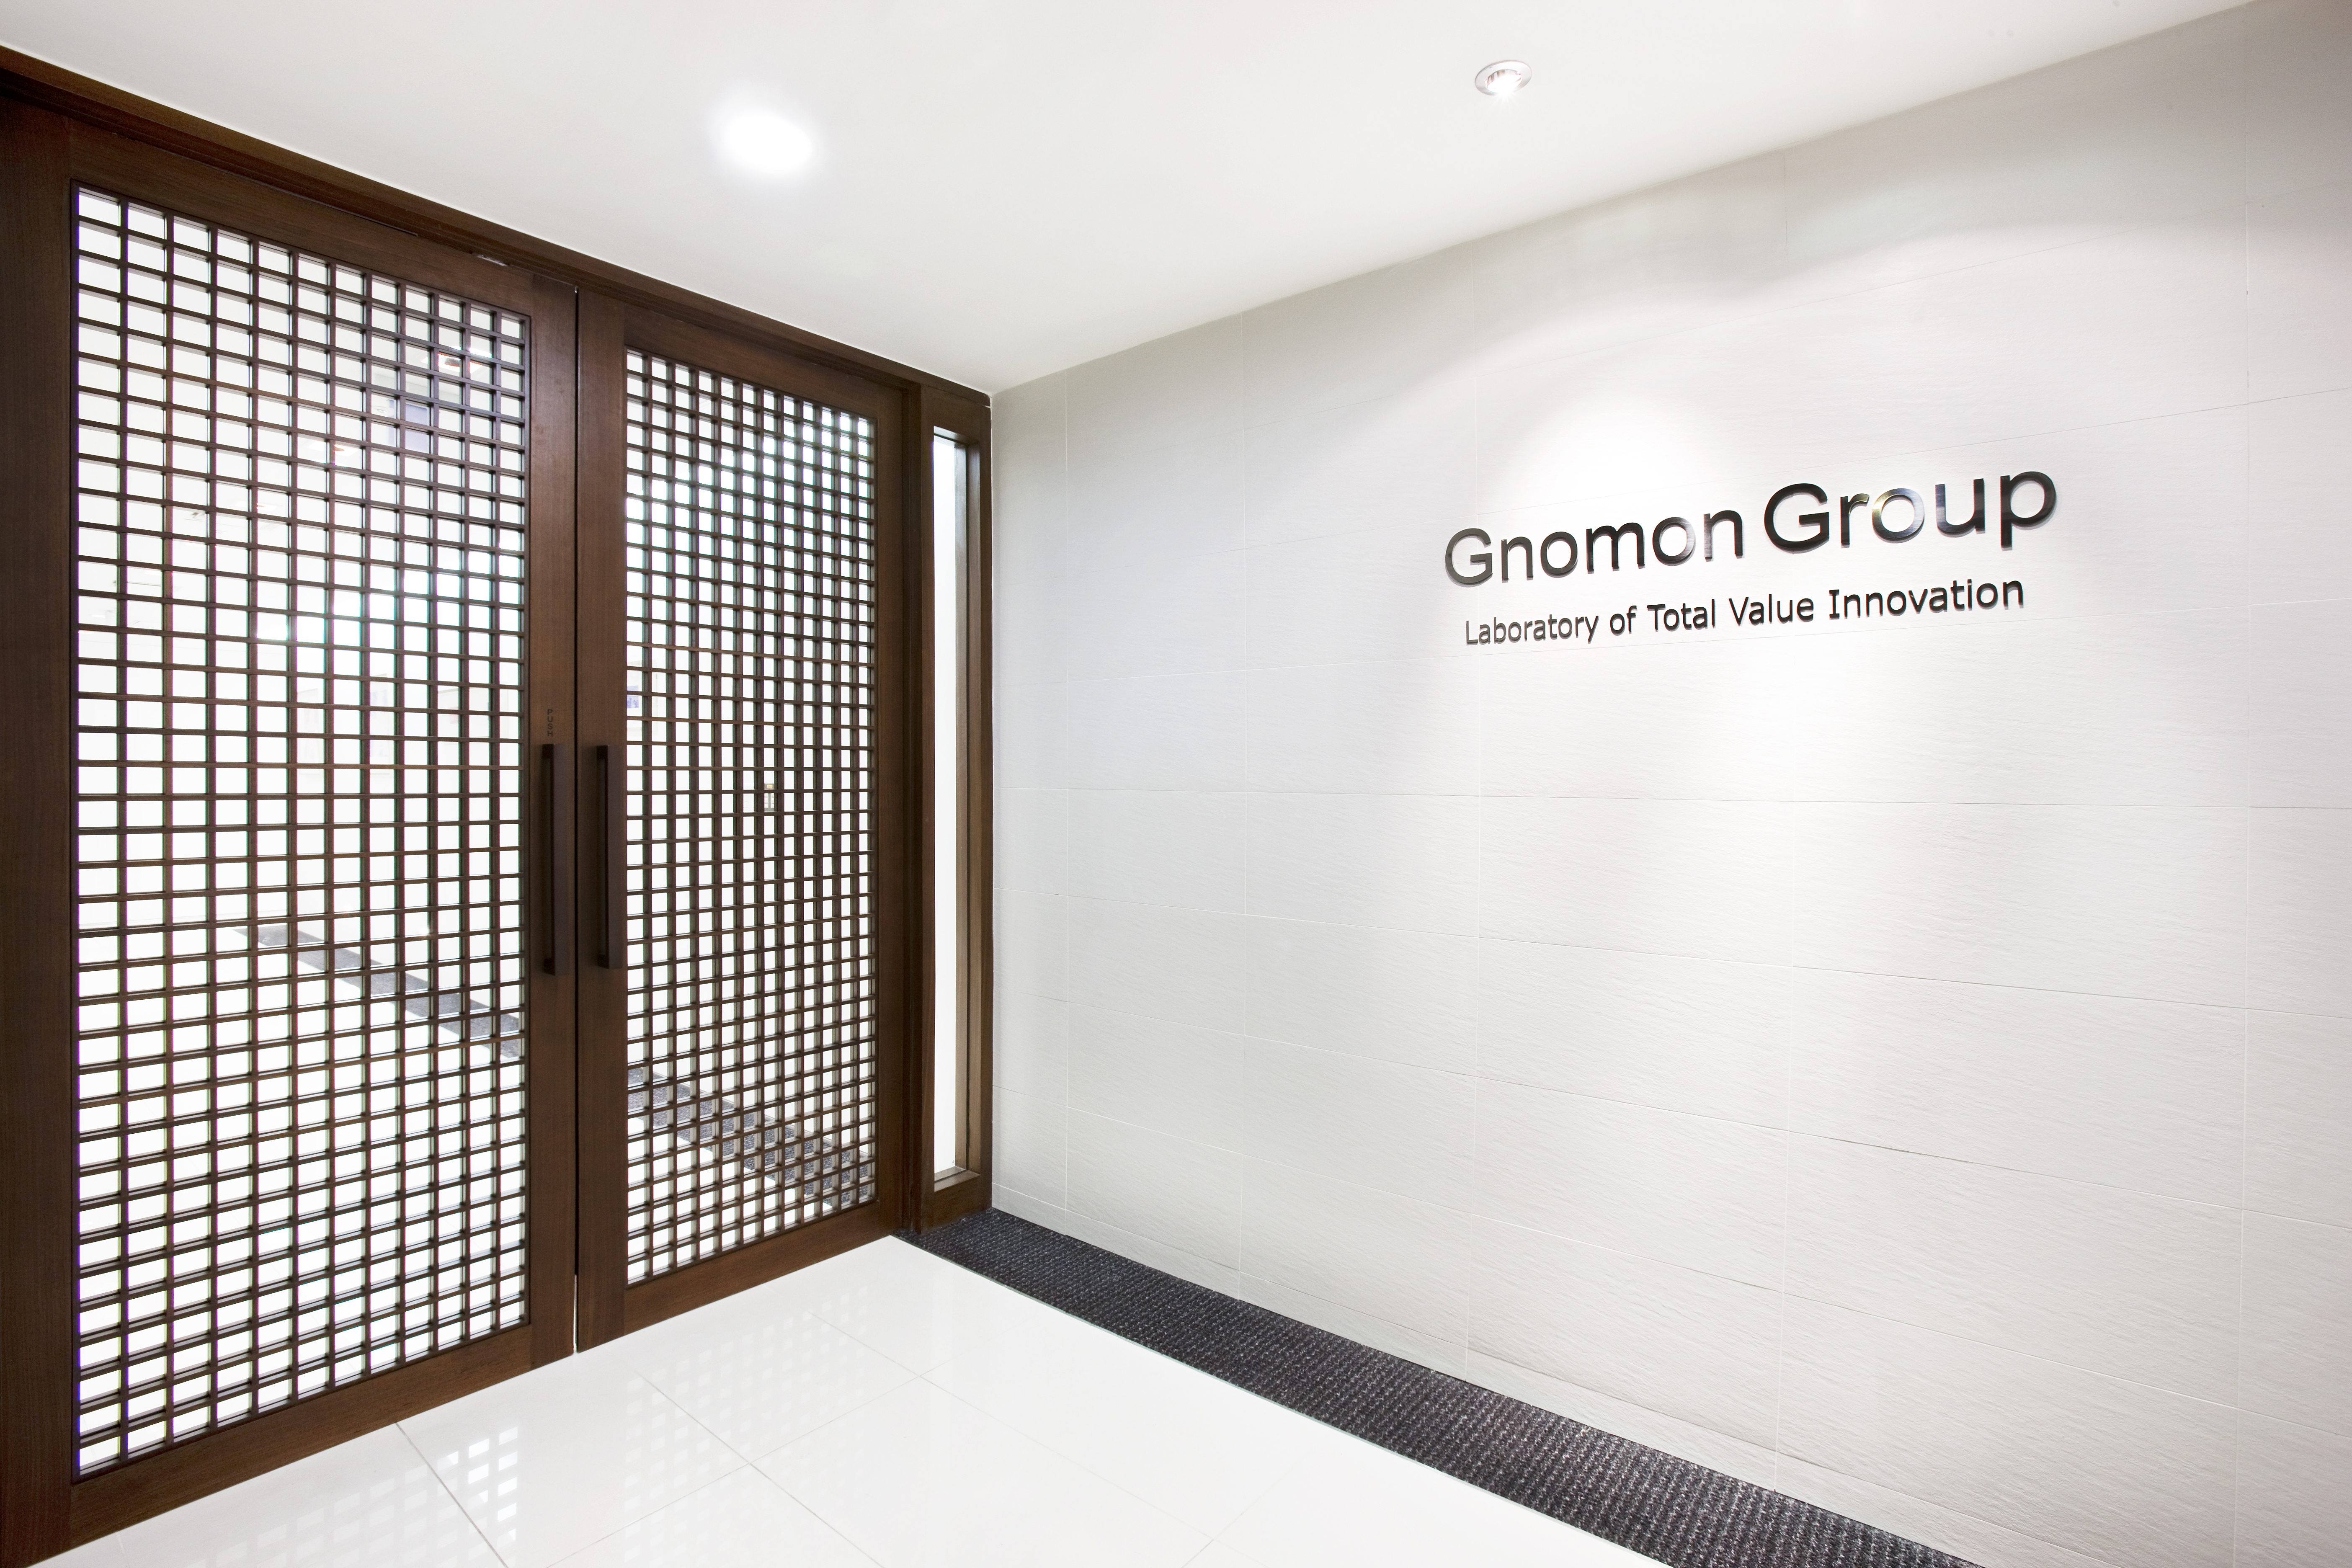 Gnomon Groupa